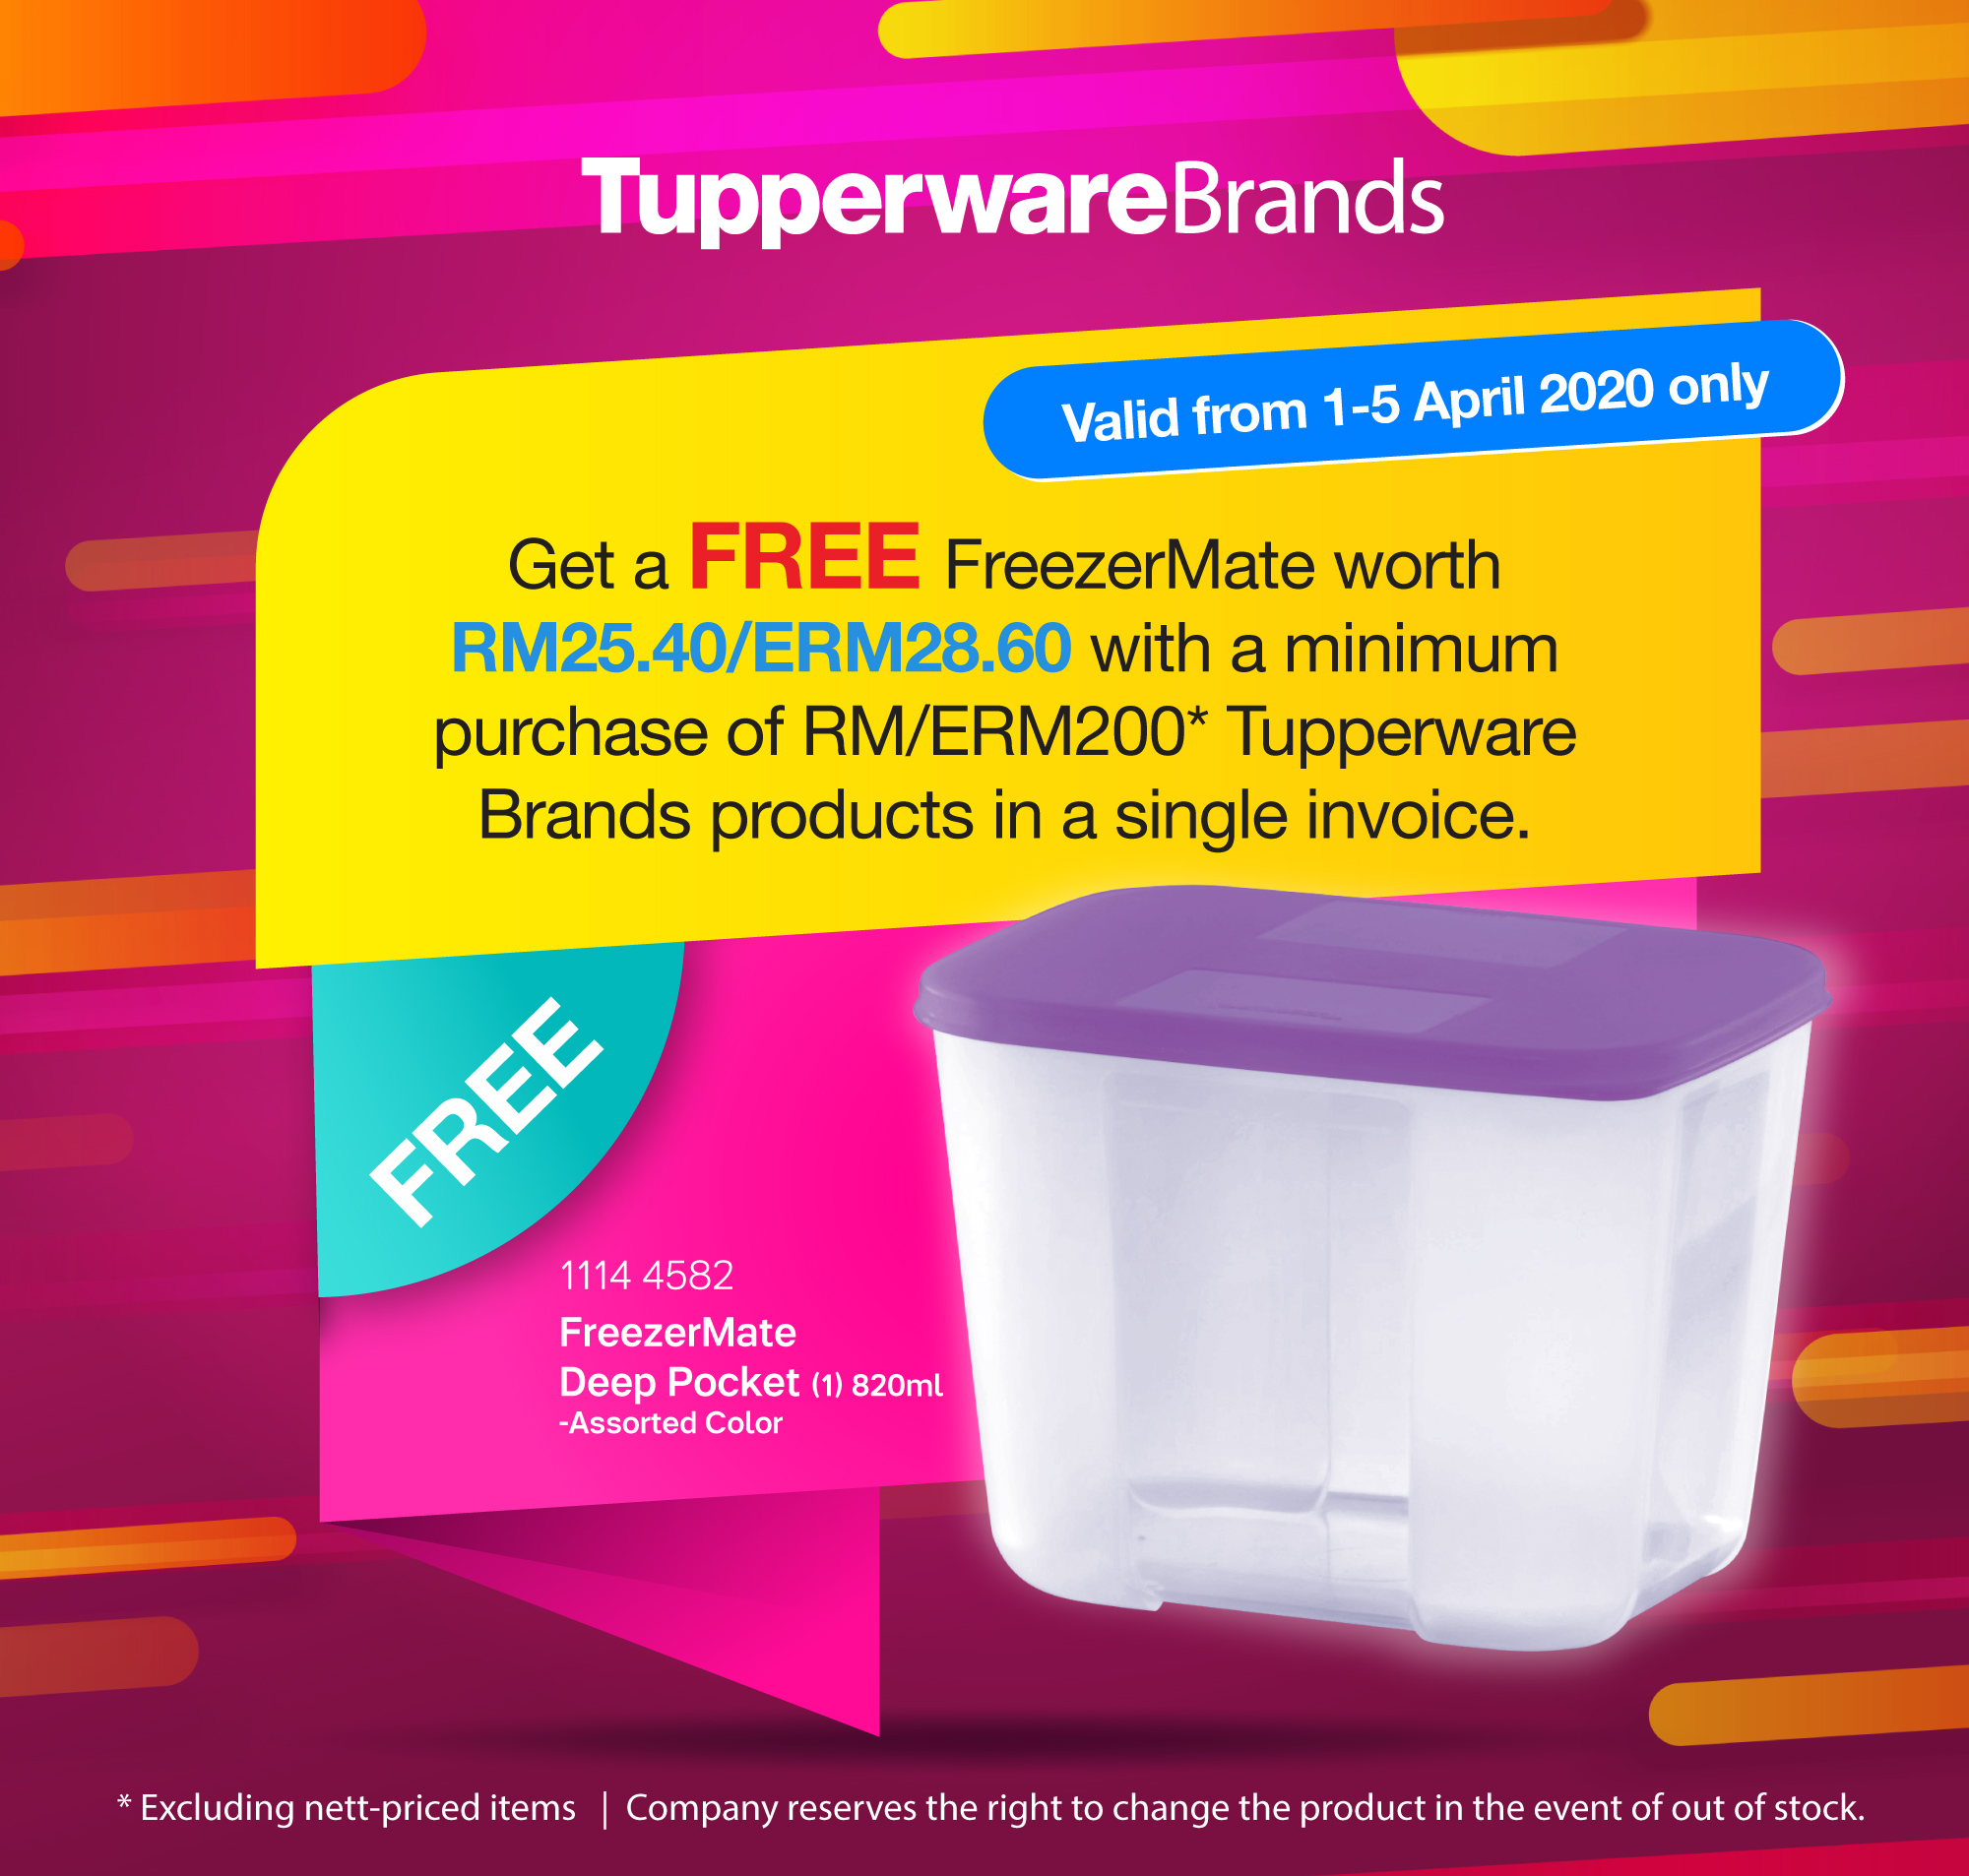 Free FreezerMate